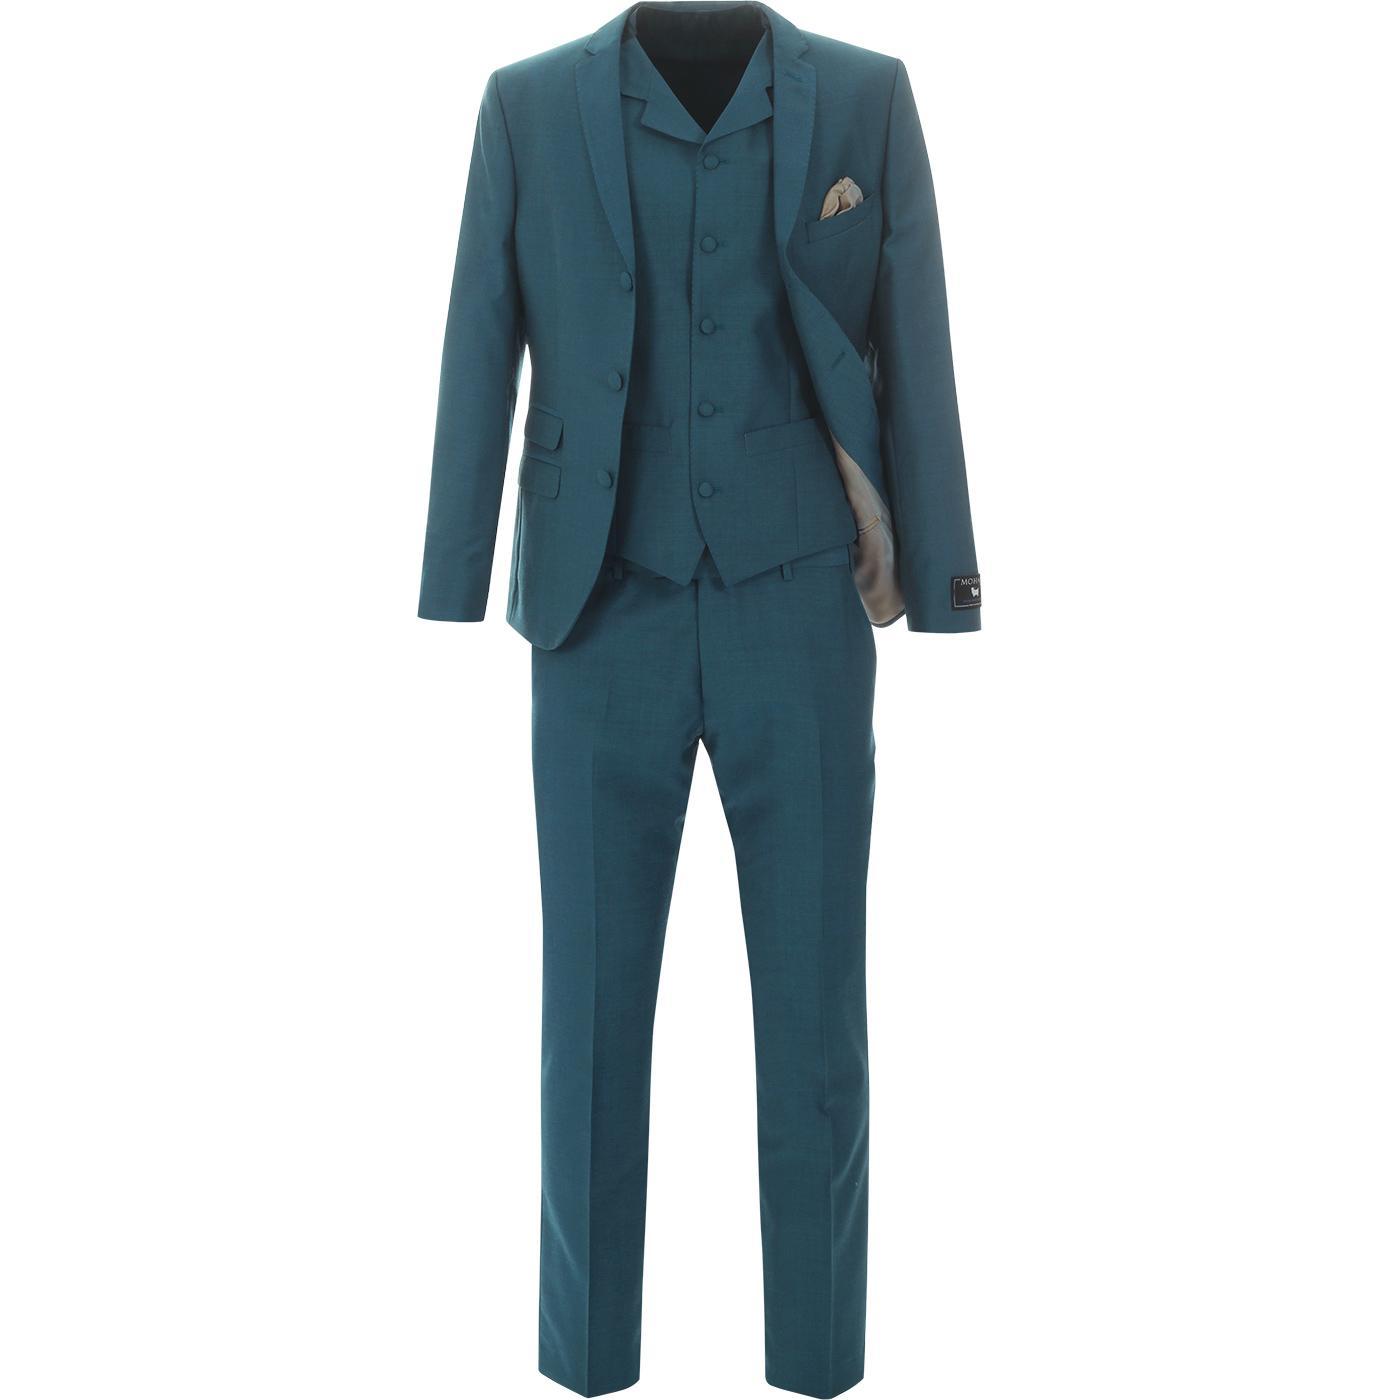 MADCAP ENGLAND 60s Mod 2/3 Piece Suit in Teal